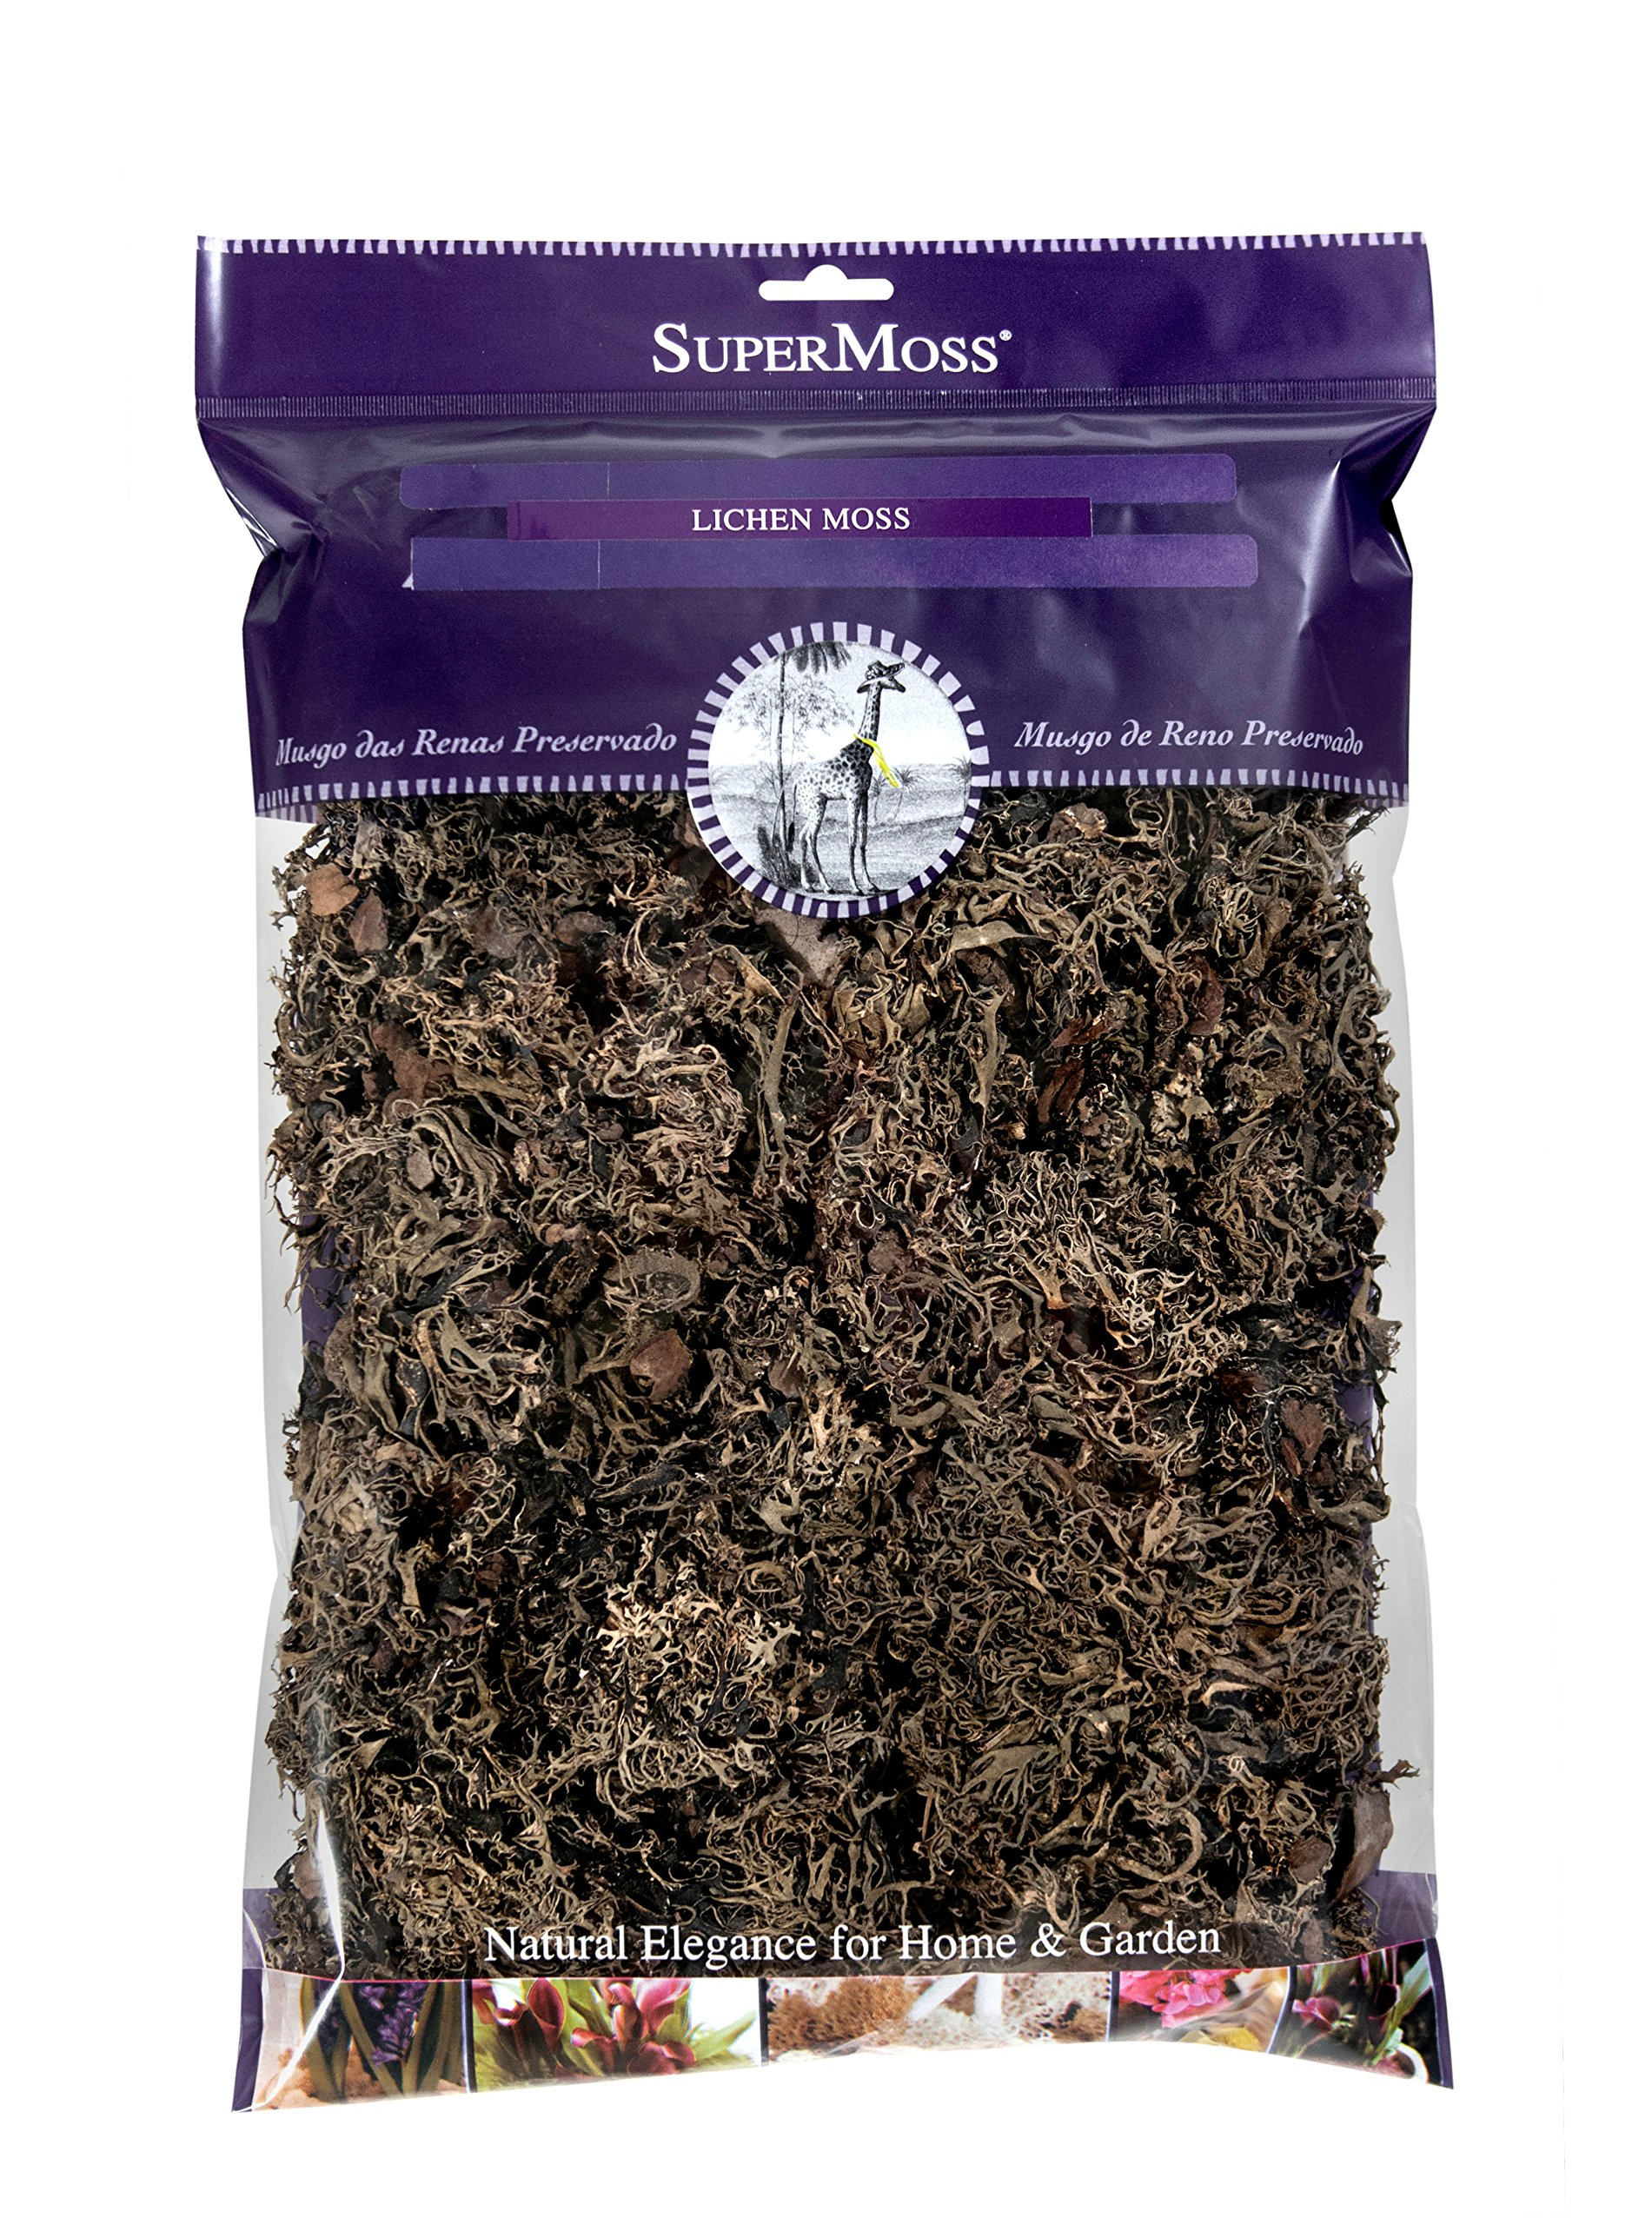 Super Moss (21802) Lichen Parmelia (No Stem), Brown, 8oz